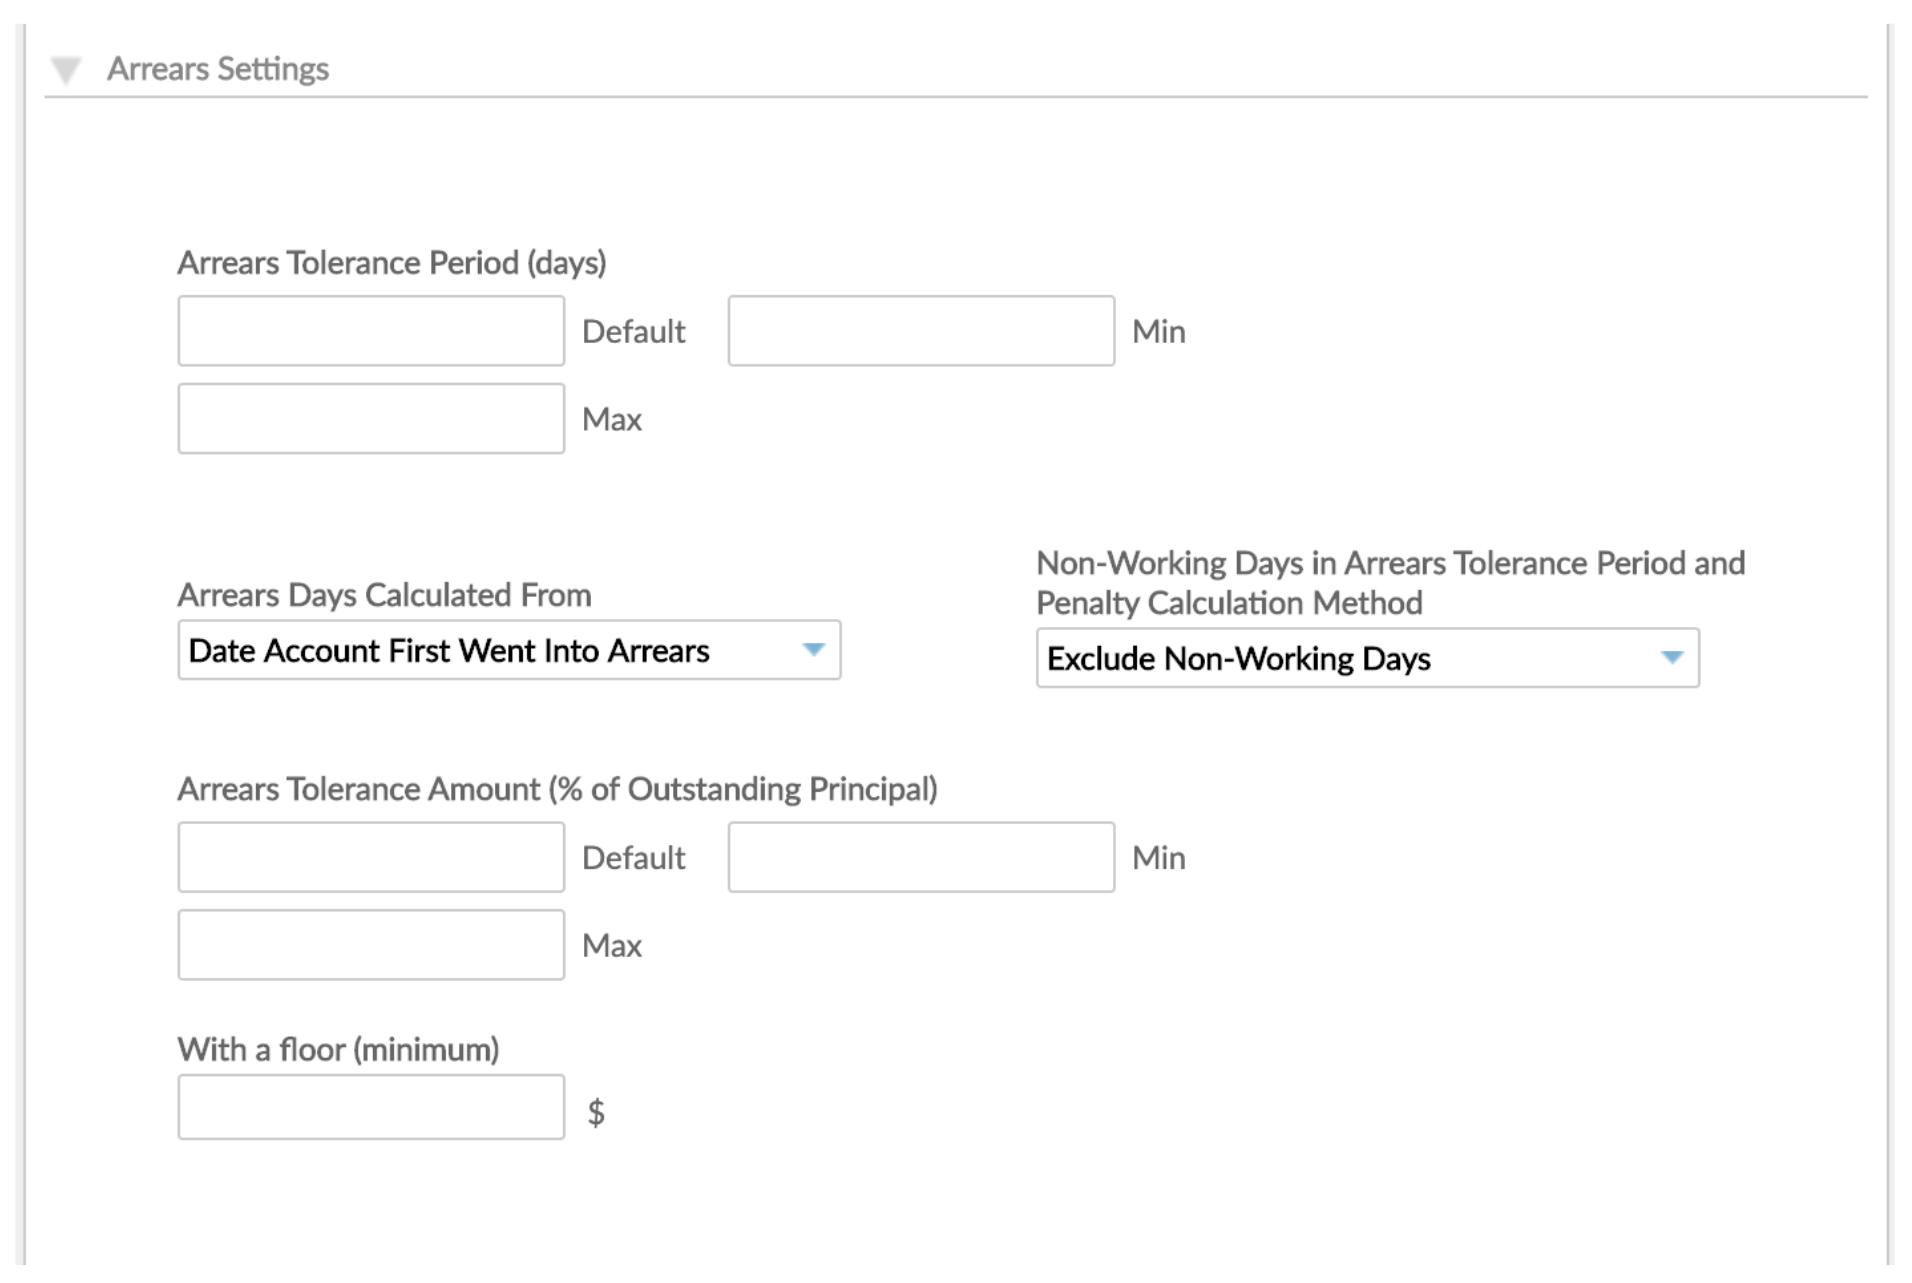 arrears-settings-tolerance.png